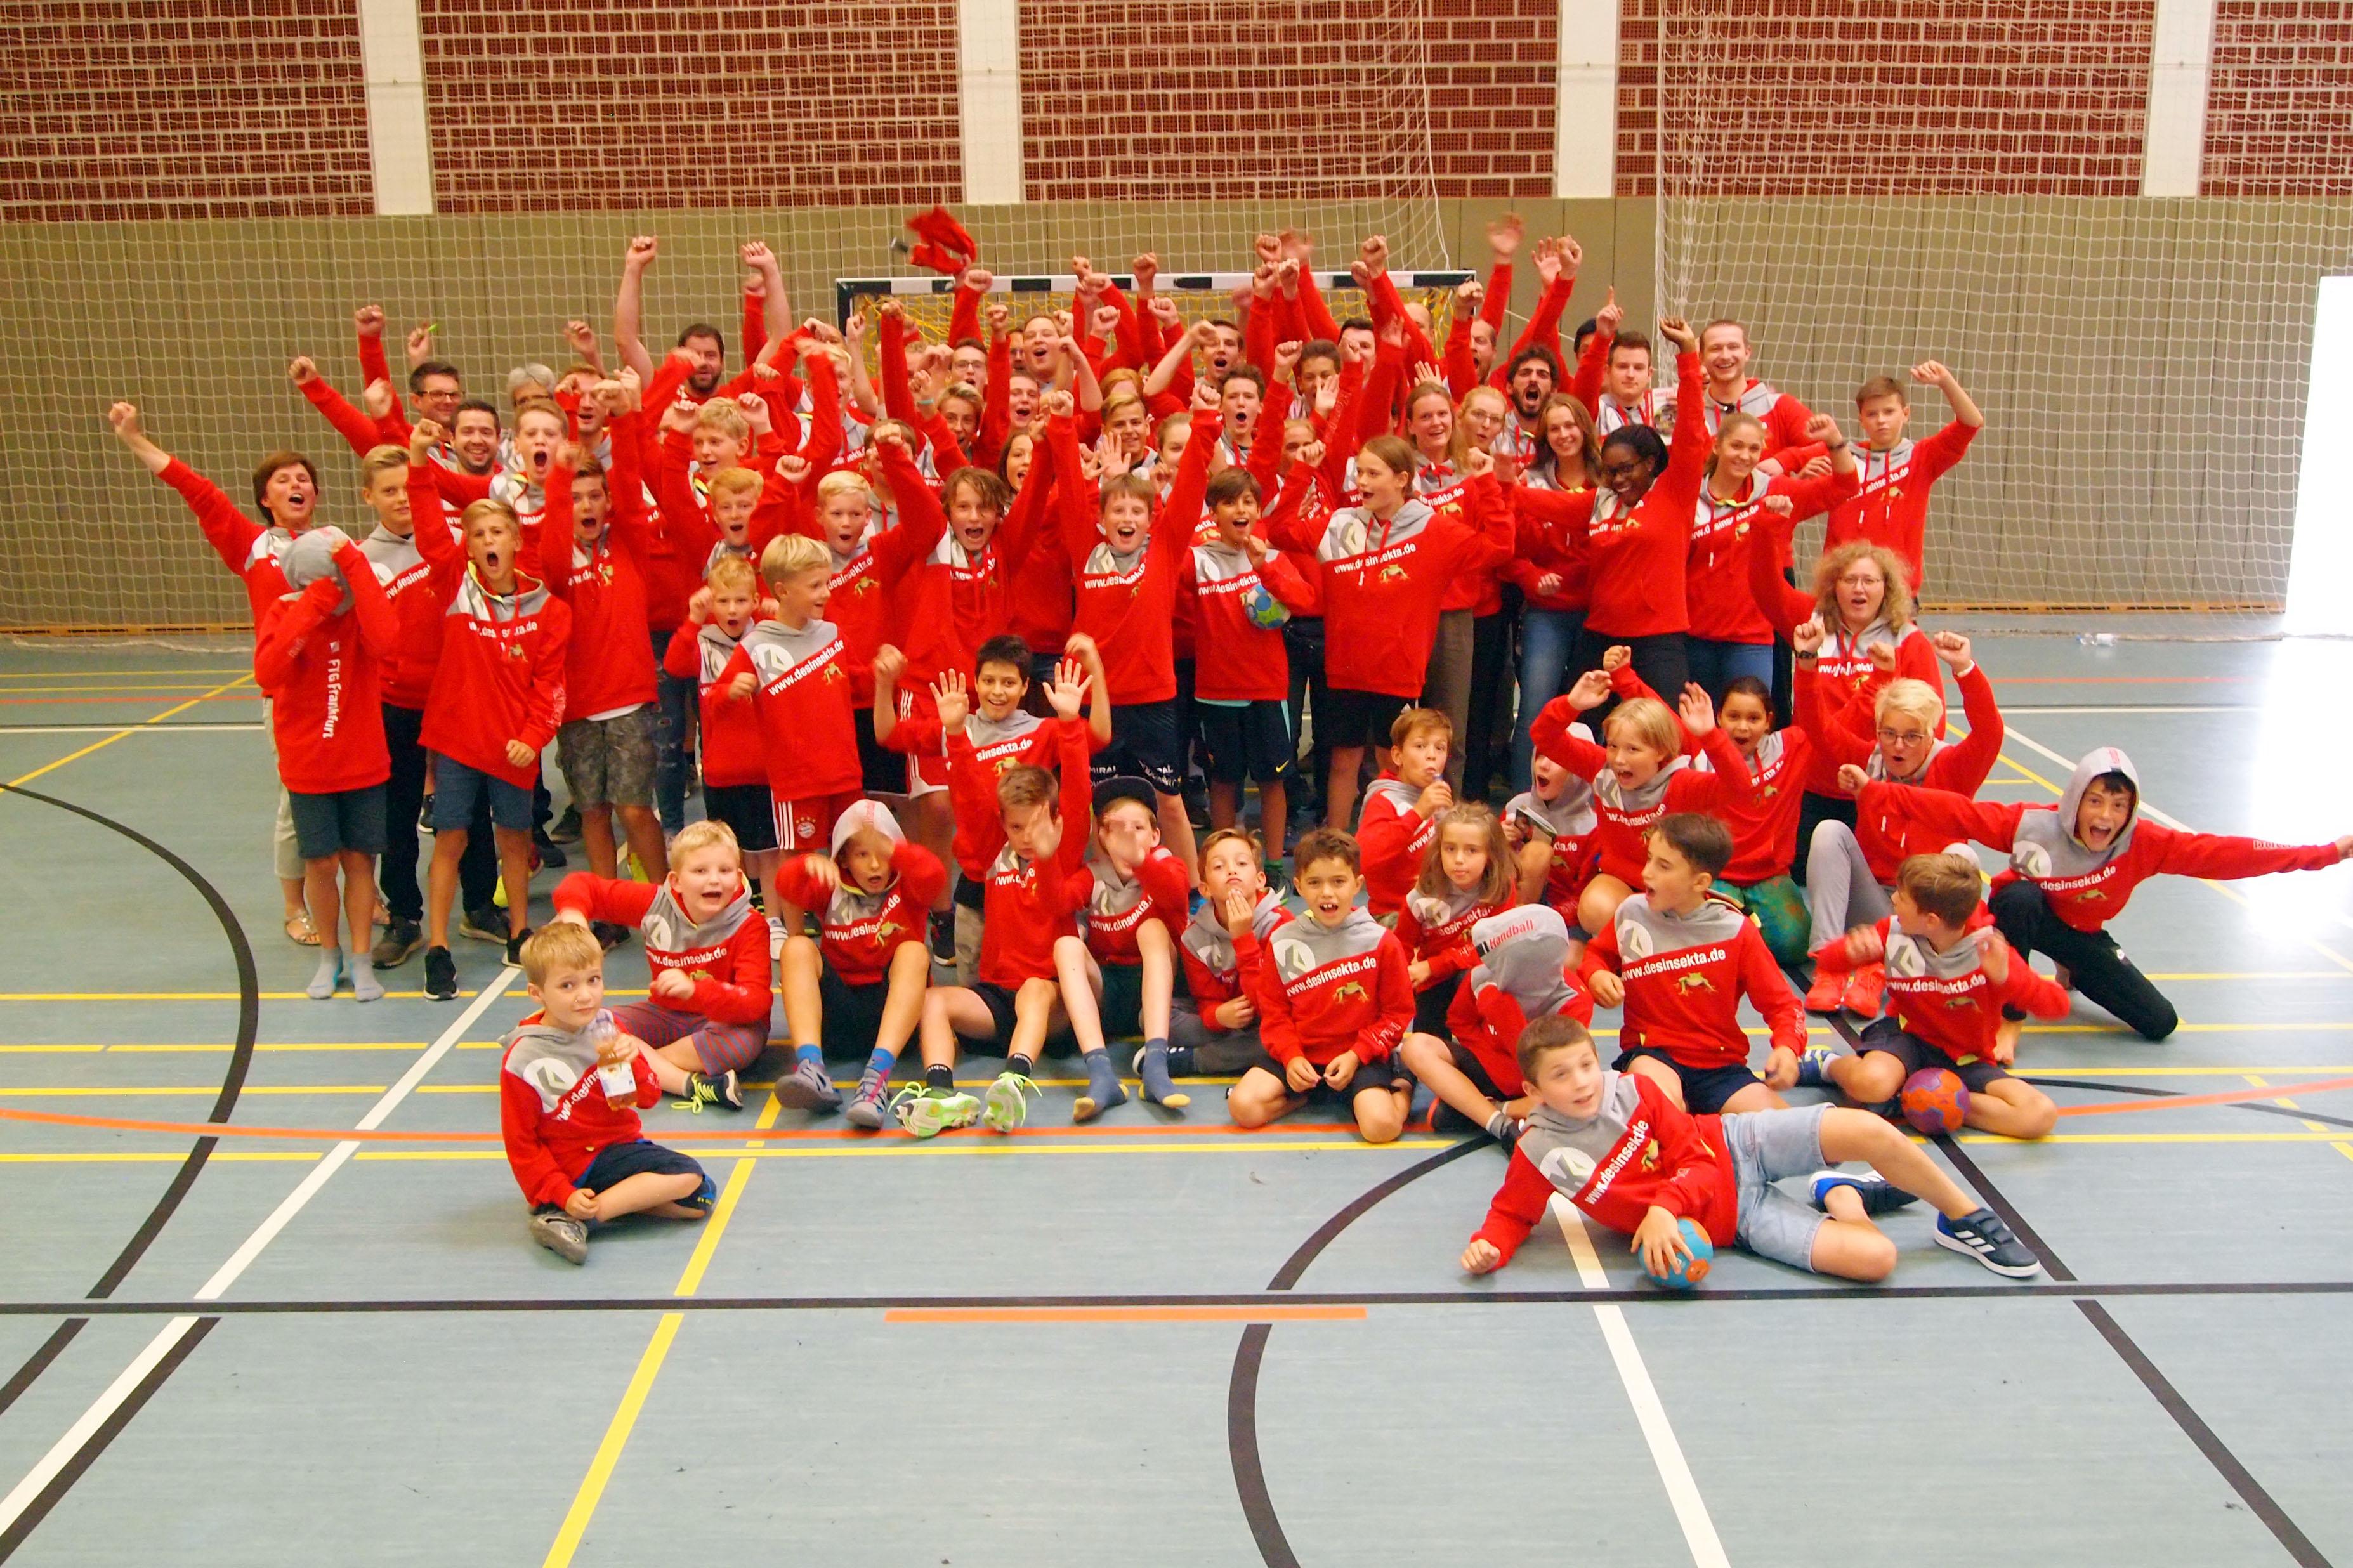 Wir sind FTG Frankfurt Handball!